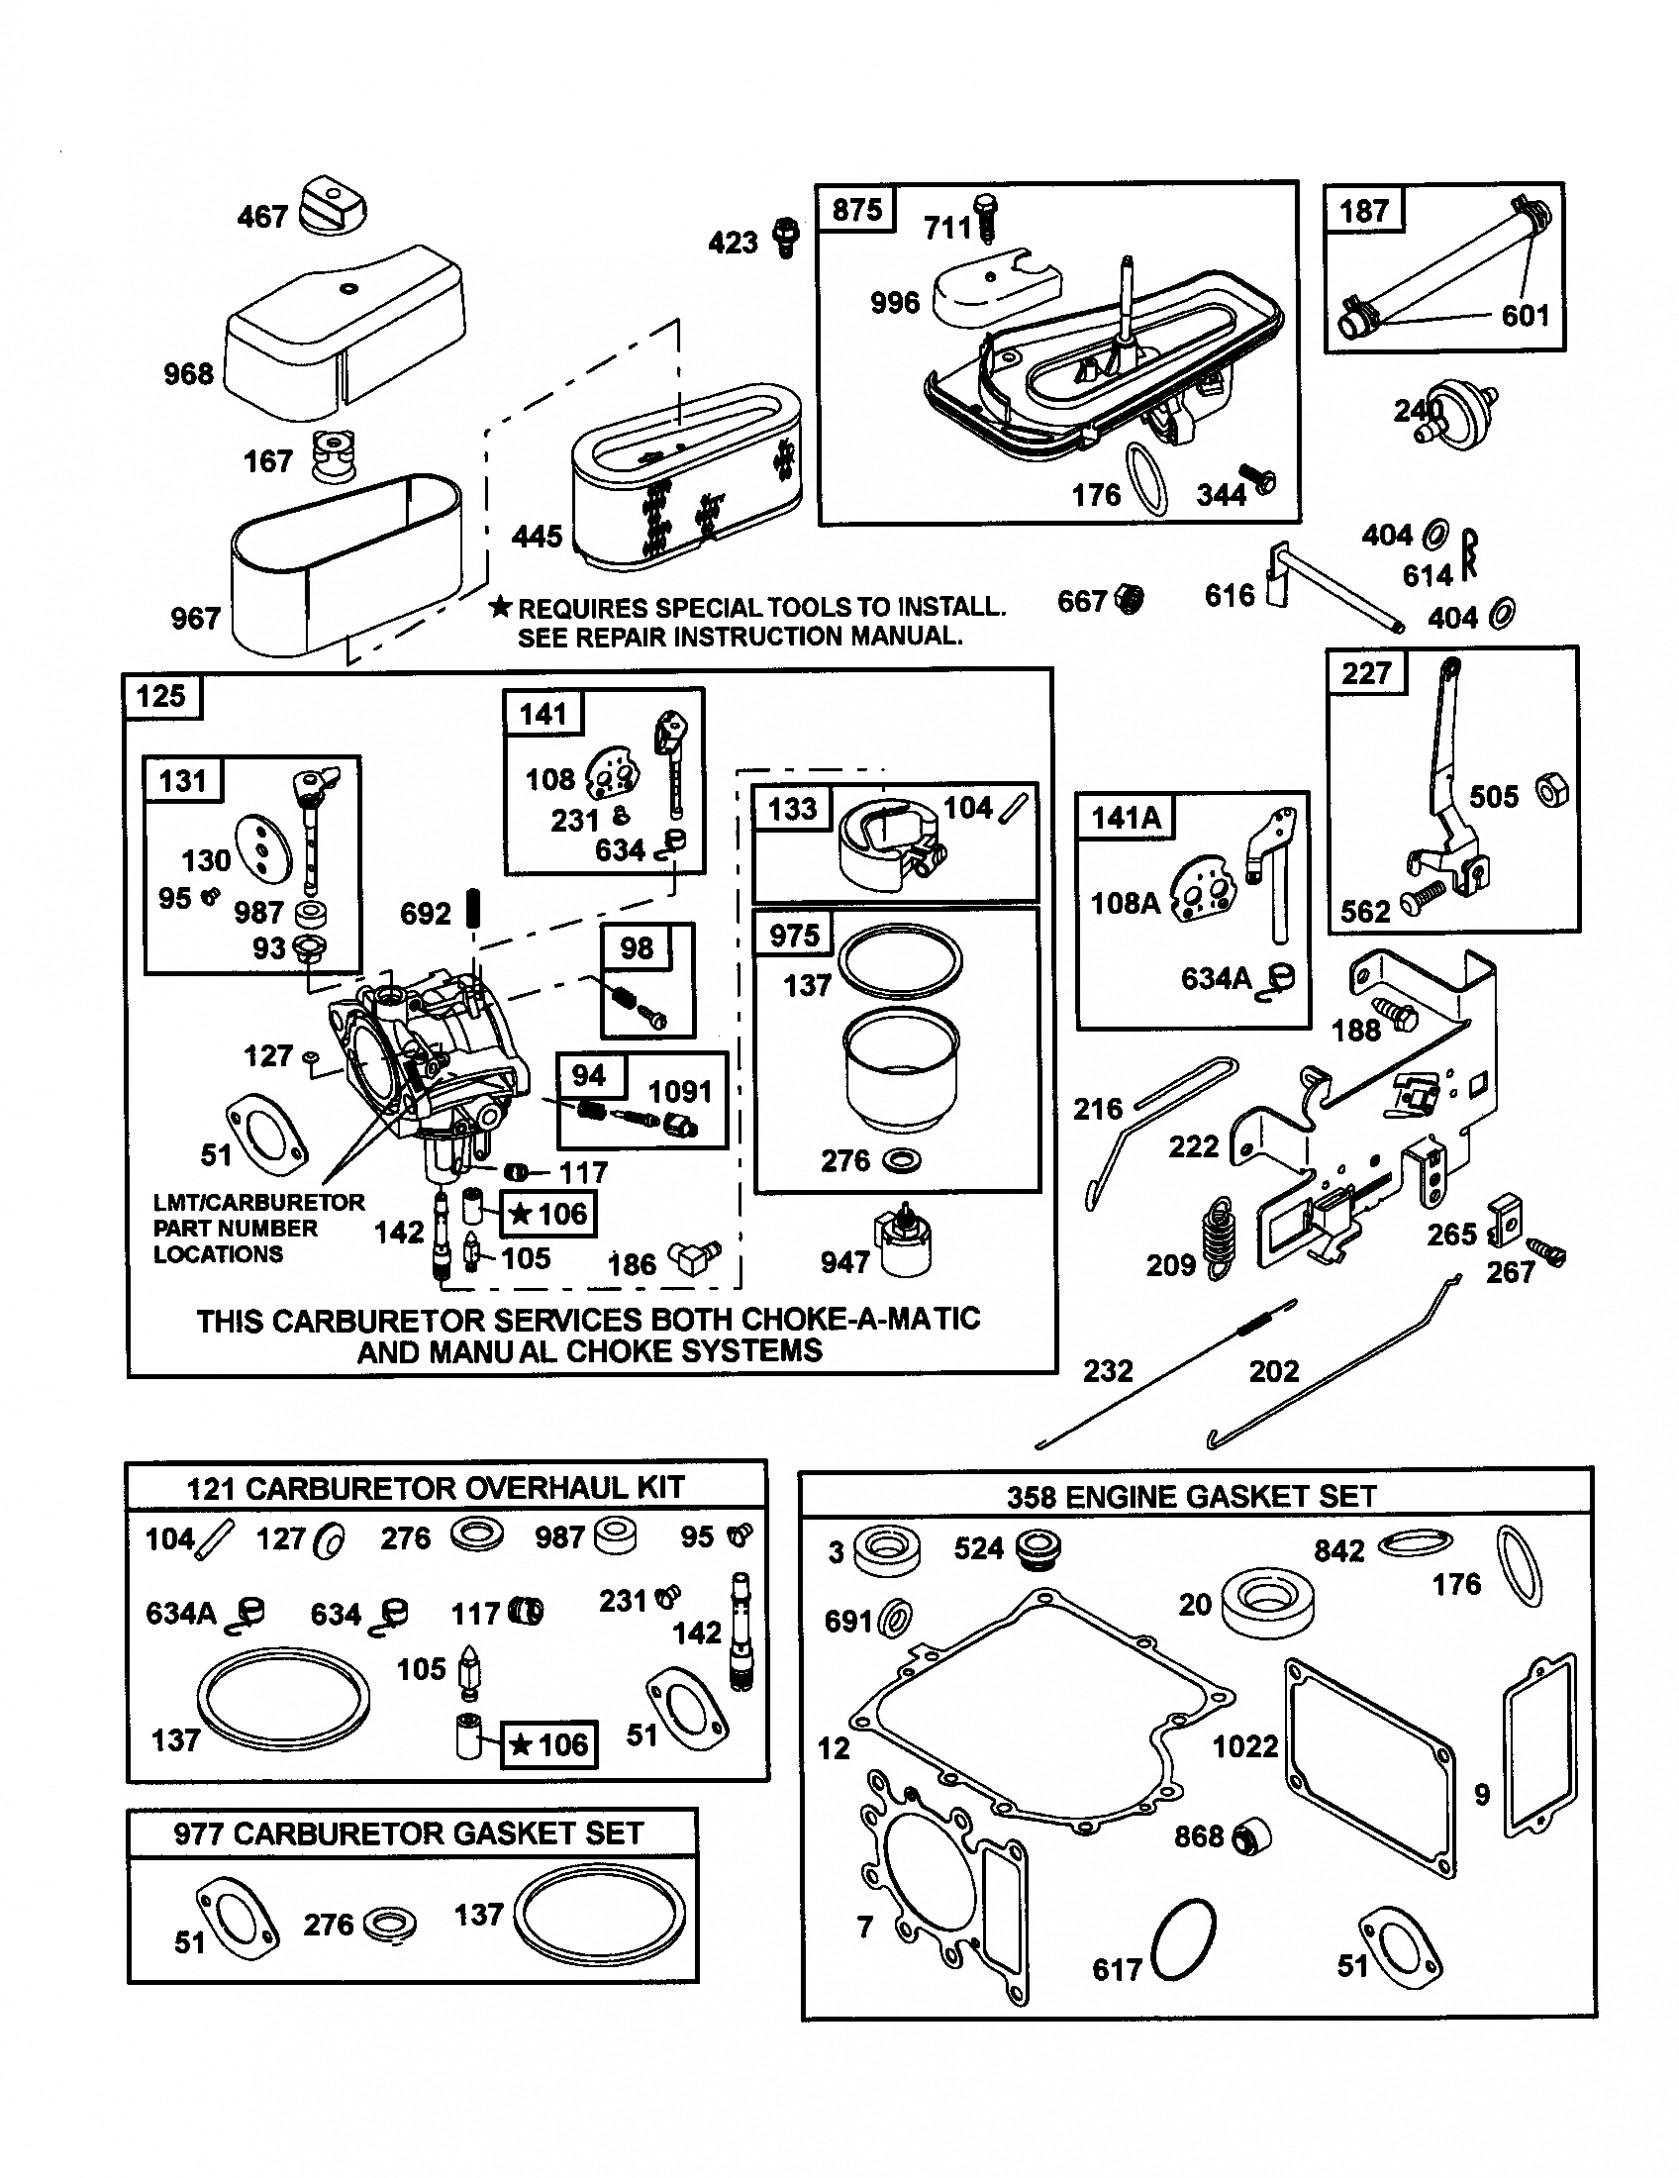 17.5 Briggs and Stratton Engine Diagram Briggs and Stratton Nikki Carburetor Diagram — Untpikapps Of 17.5 Briggs and Stratton Engine Diagram